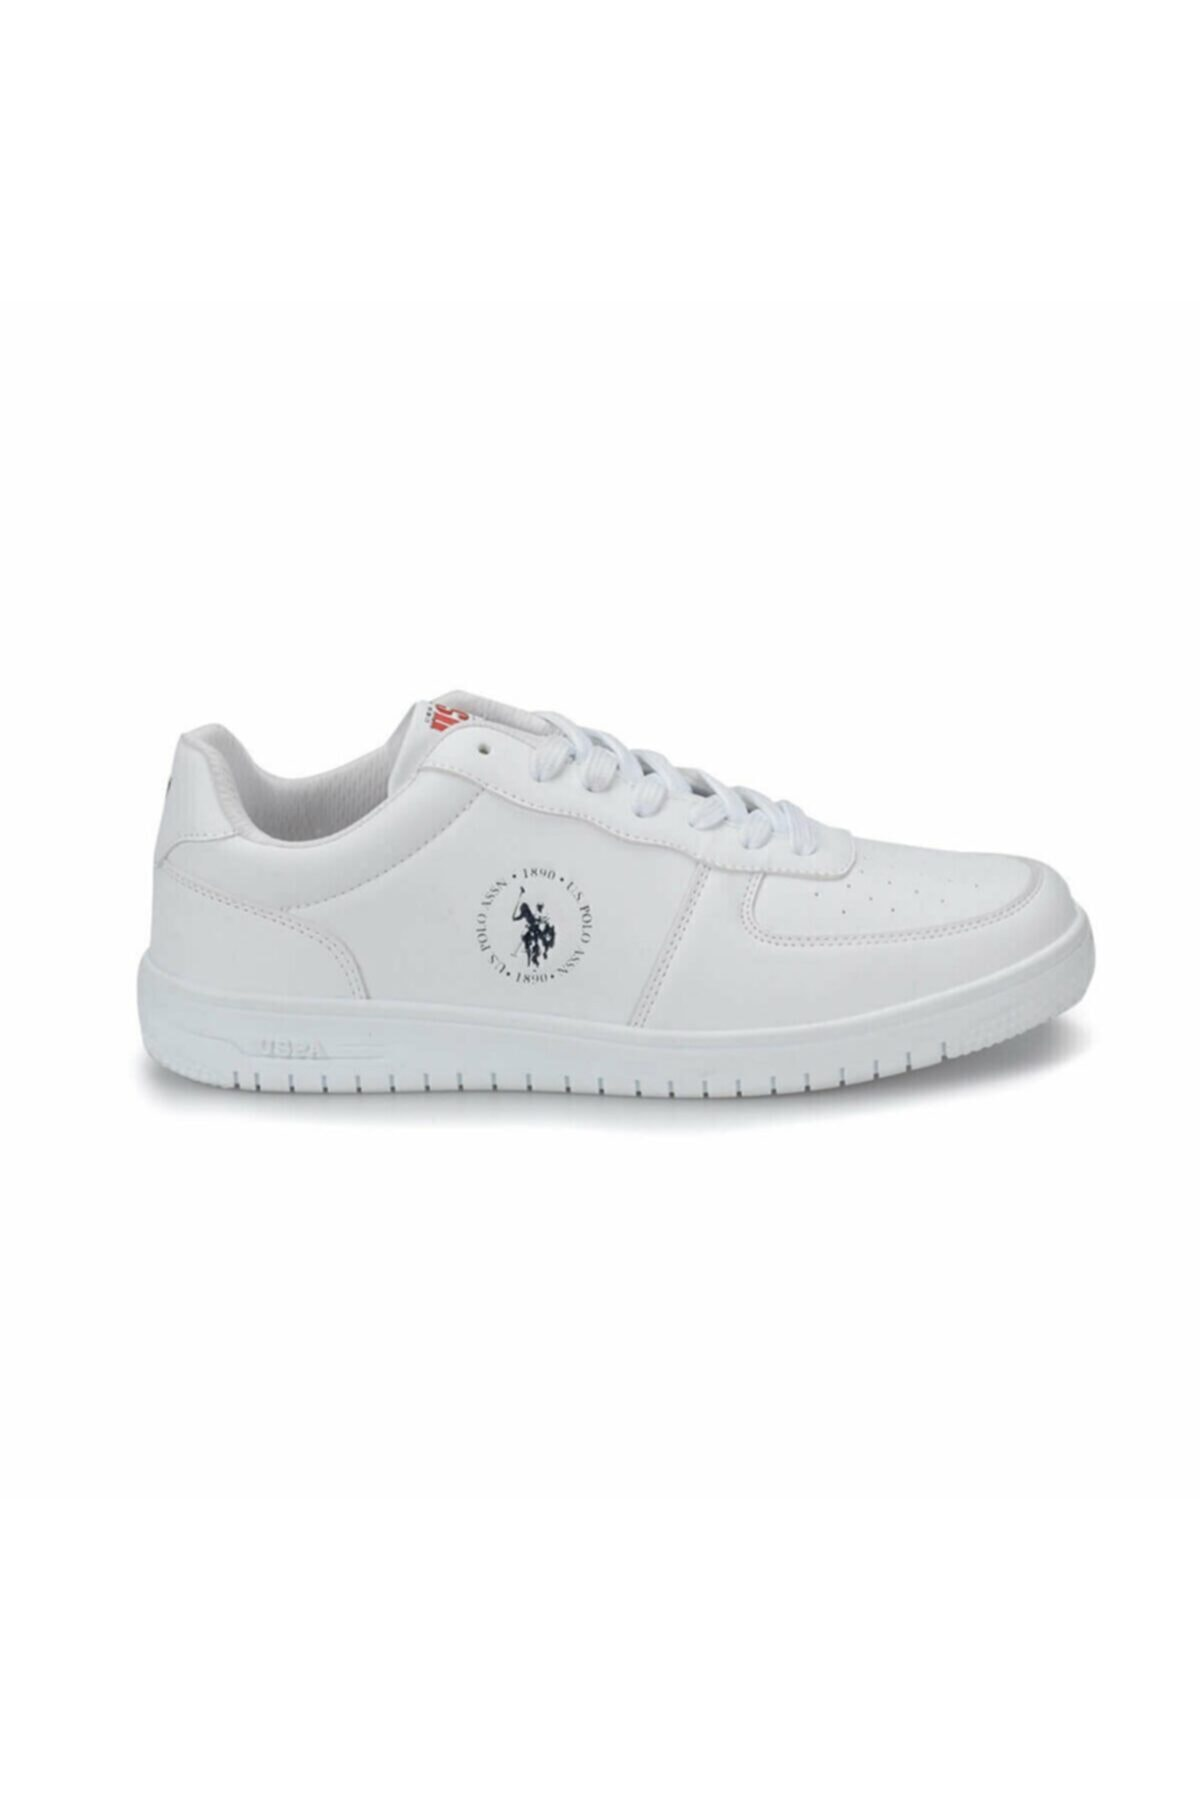 U.S. Polo Assn. Sneakers 2